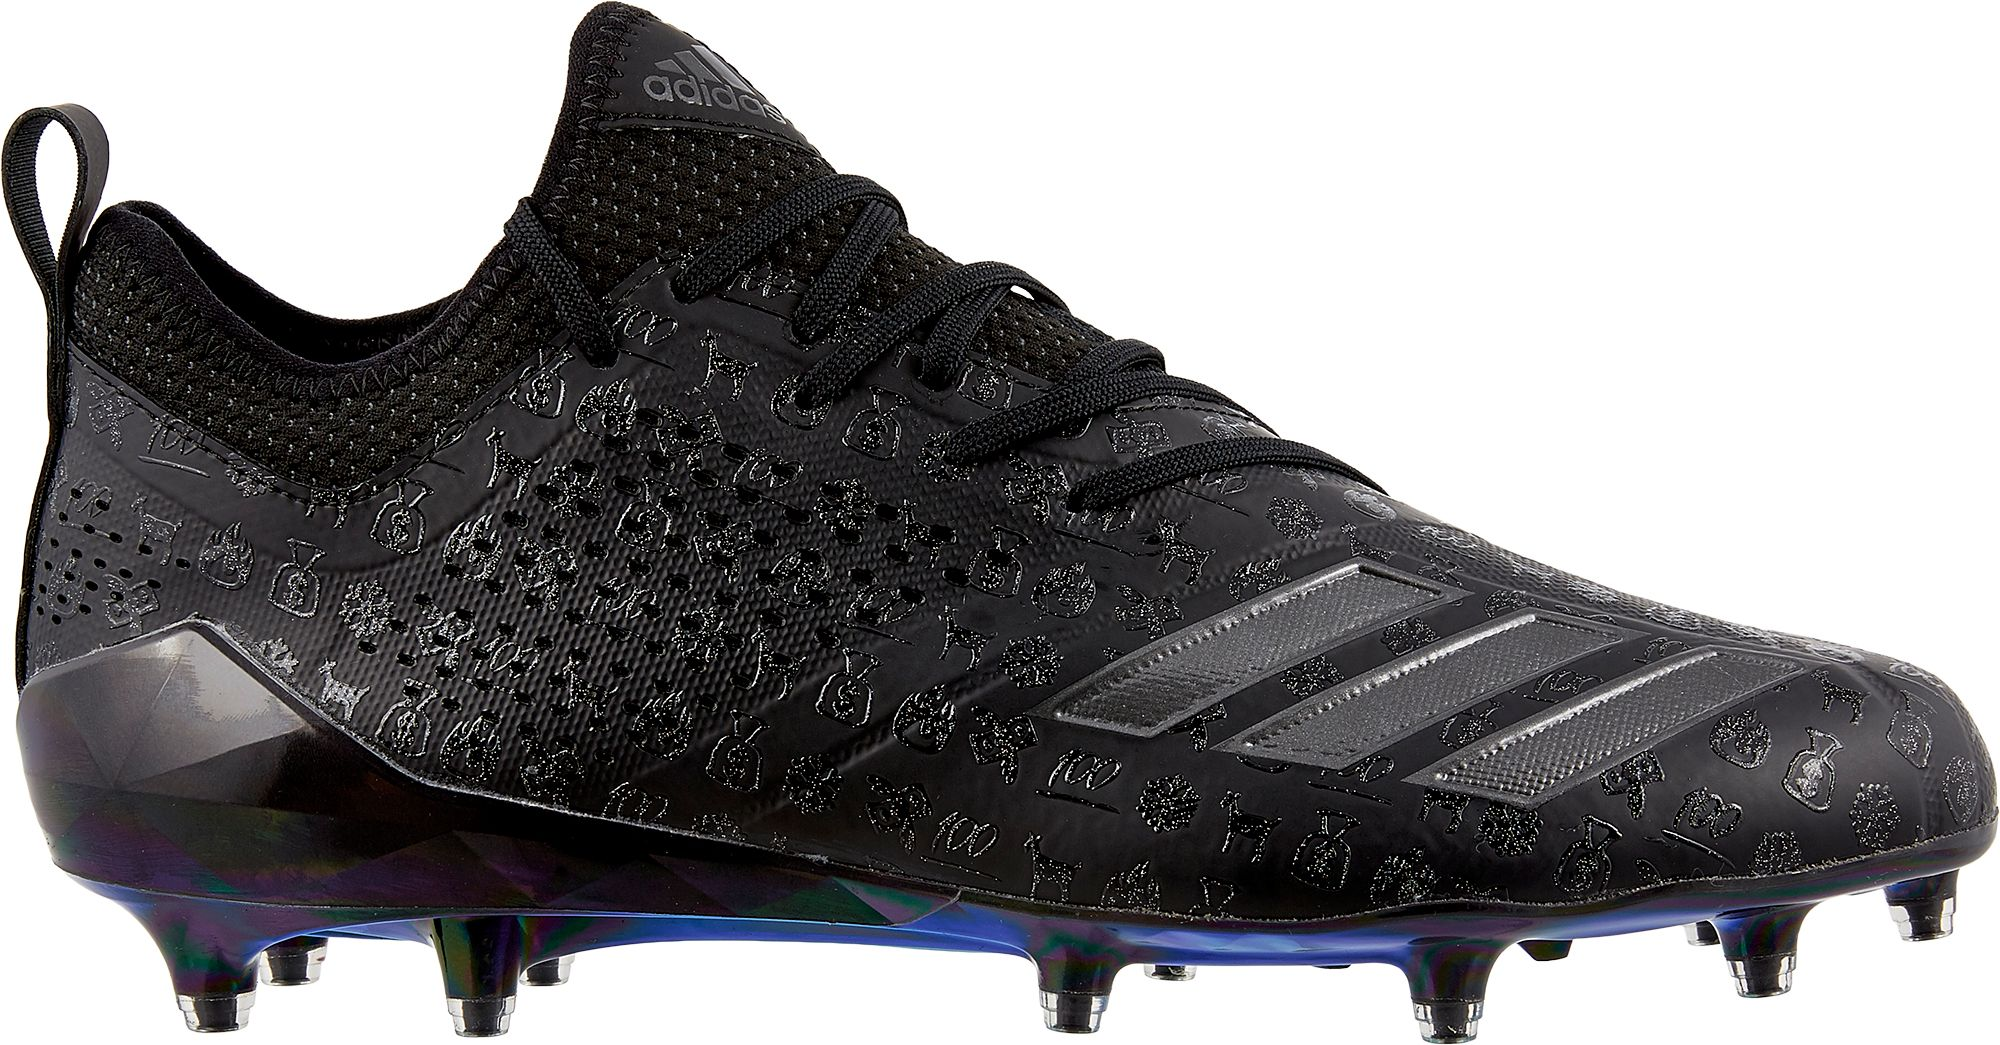 adidas football cleats adidas menu0027s adizero 5-star 7.0 adimoji football cleats | dicku0027s sporting  goods TUPRDLZ